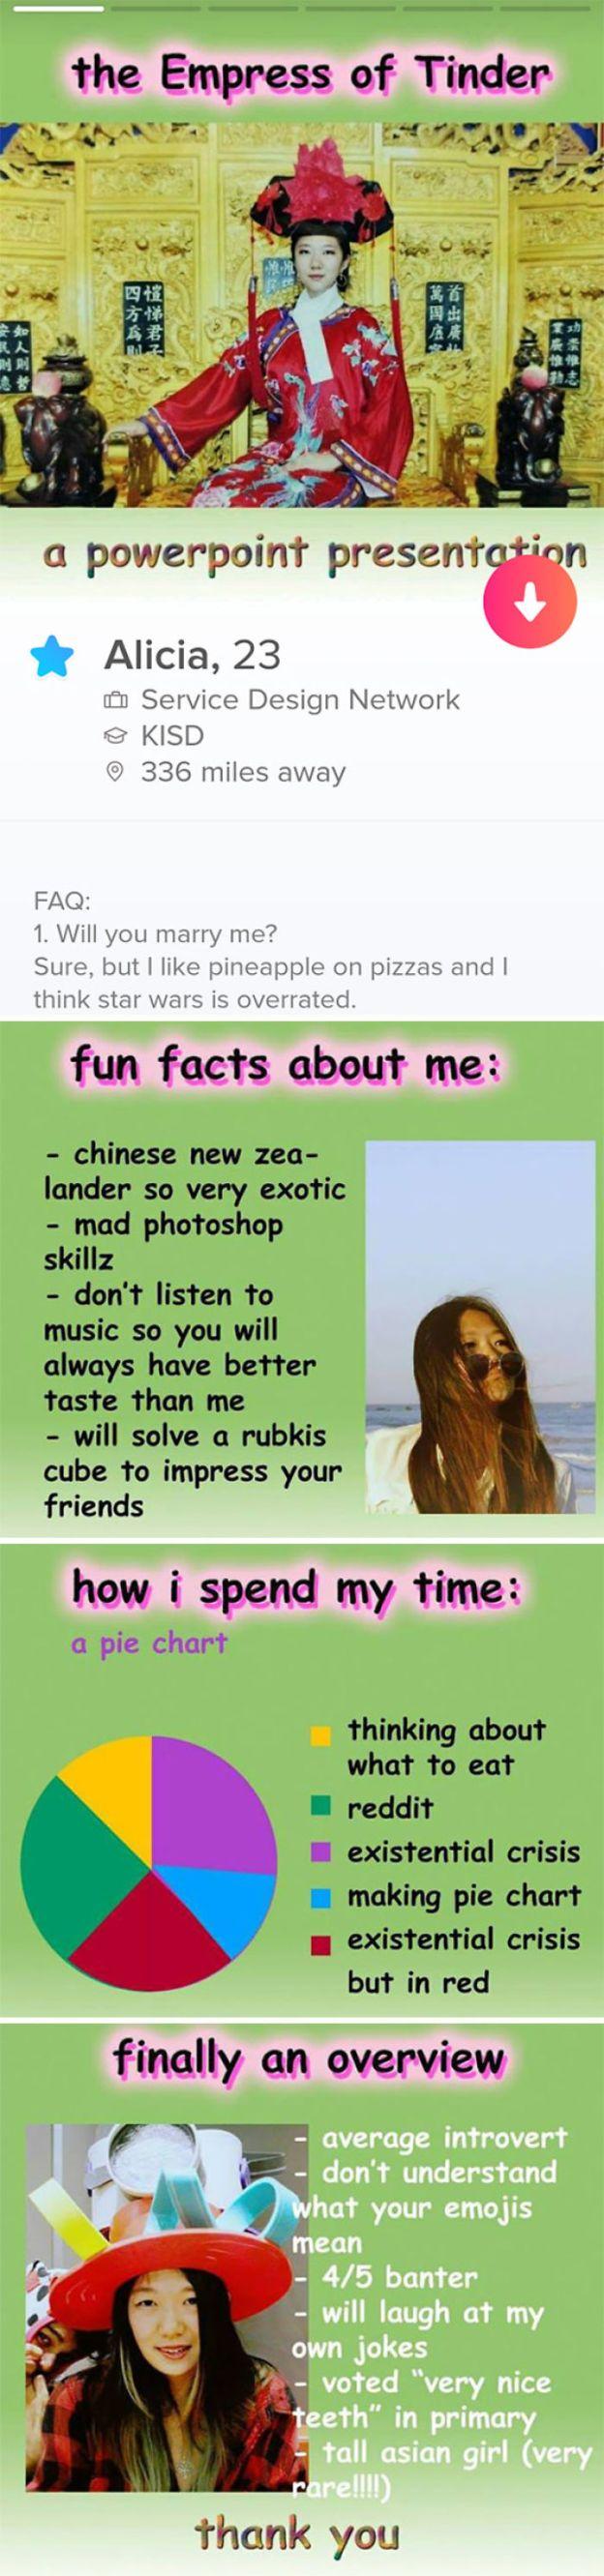 hilarious-tinder-bios-10-5bc74bd475532__700 20+ Funny Tinder Profiles That Will Make You Look Twice (New Pics) Design Random